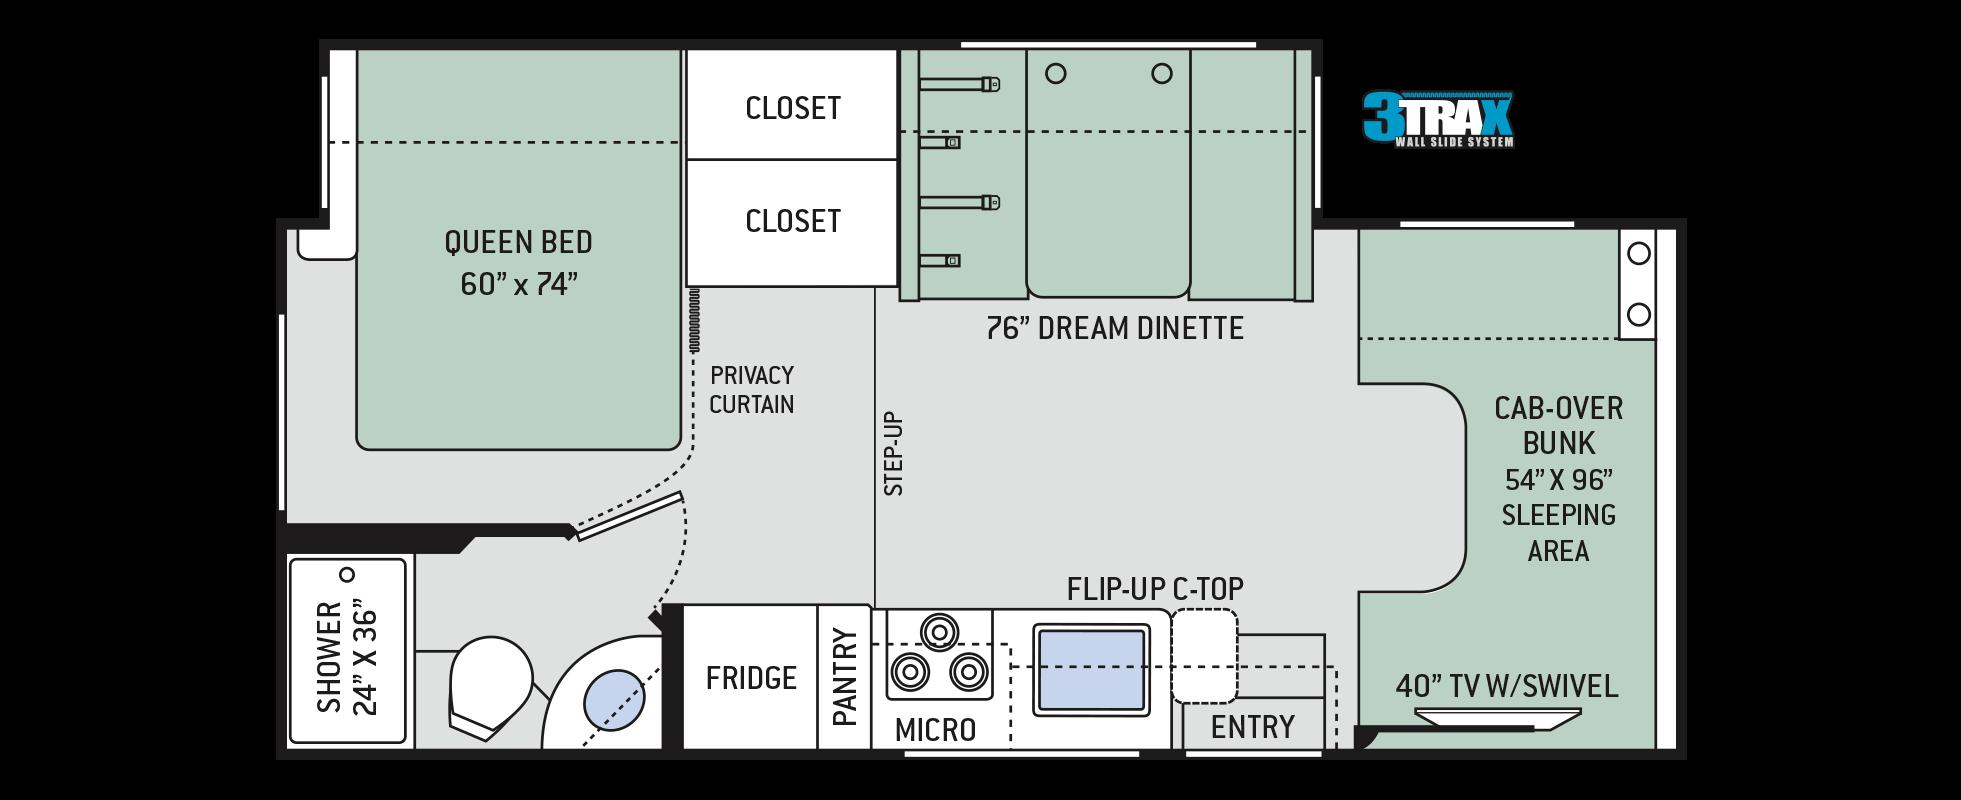 Freedom Elite Class C Motorhomes Floor Plan 24he Thor